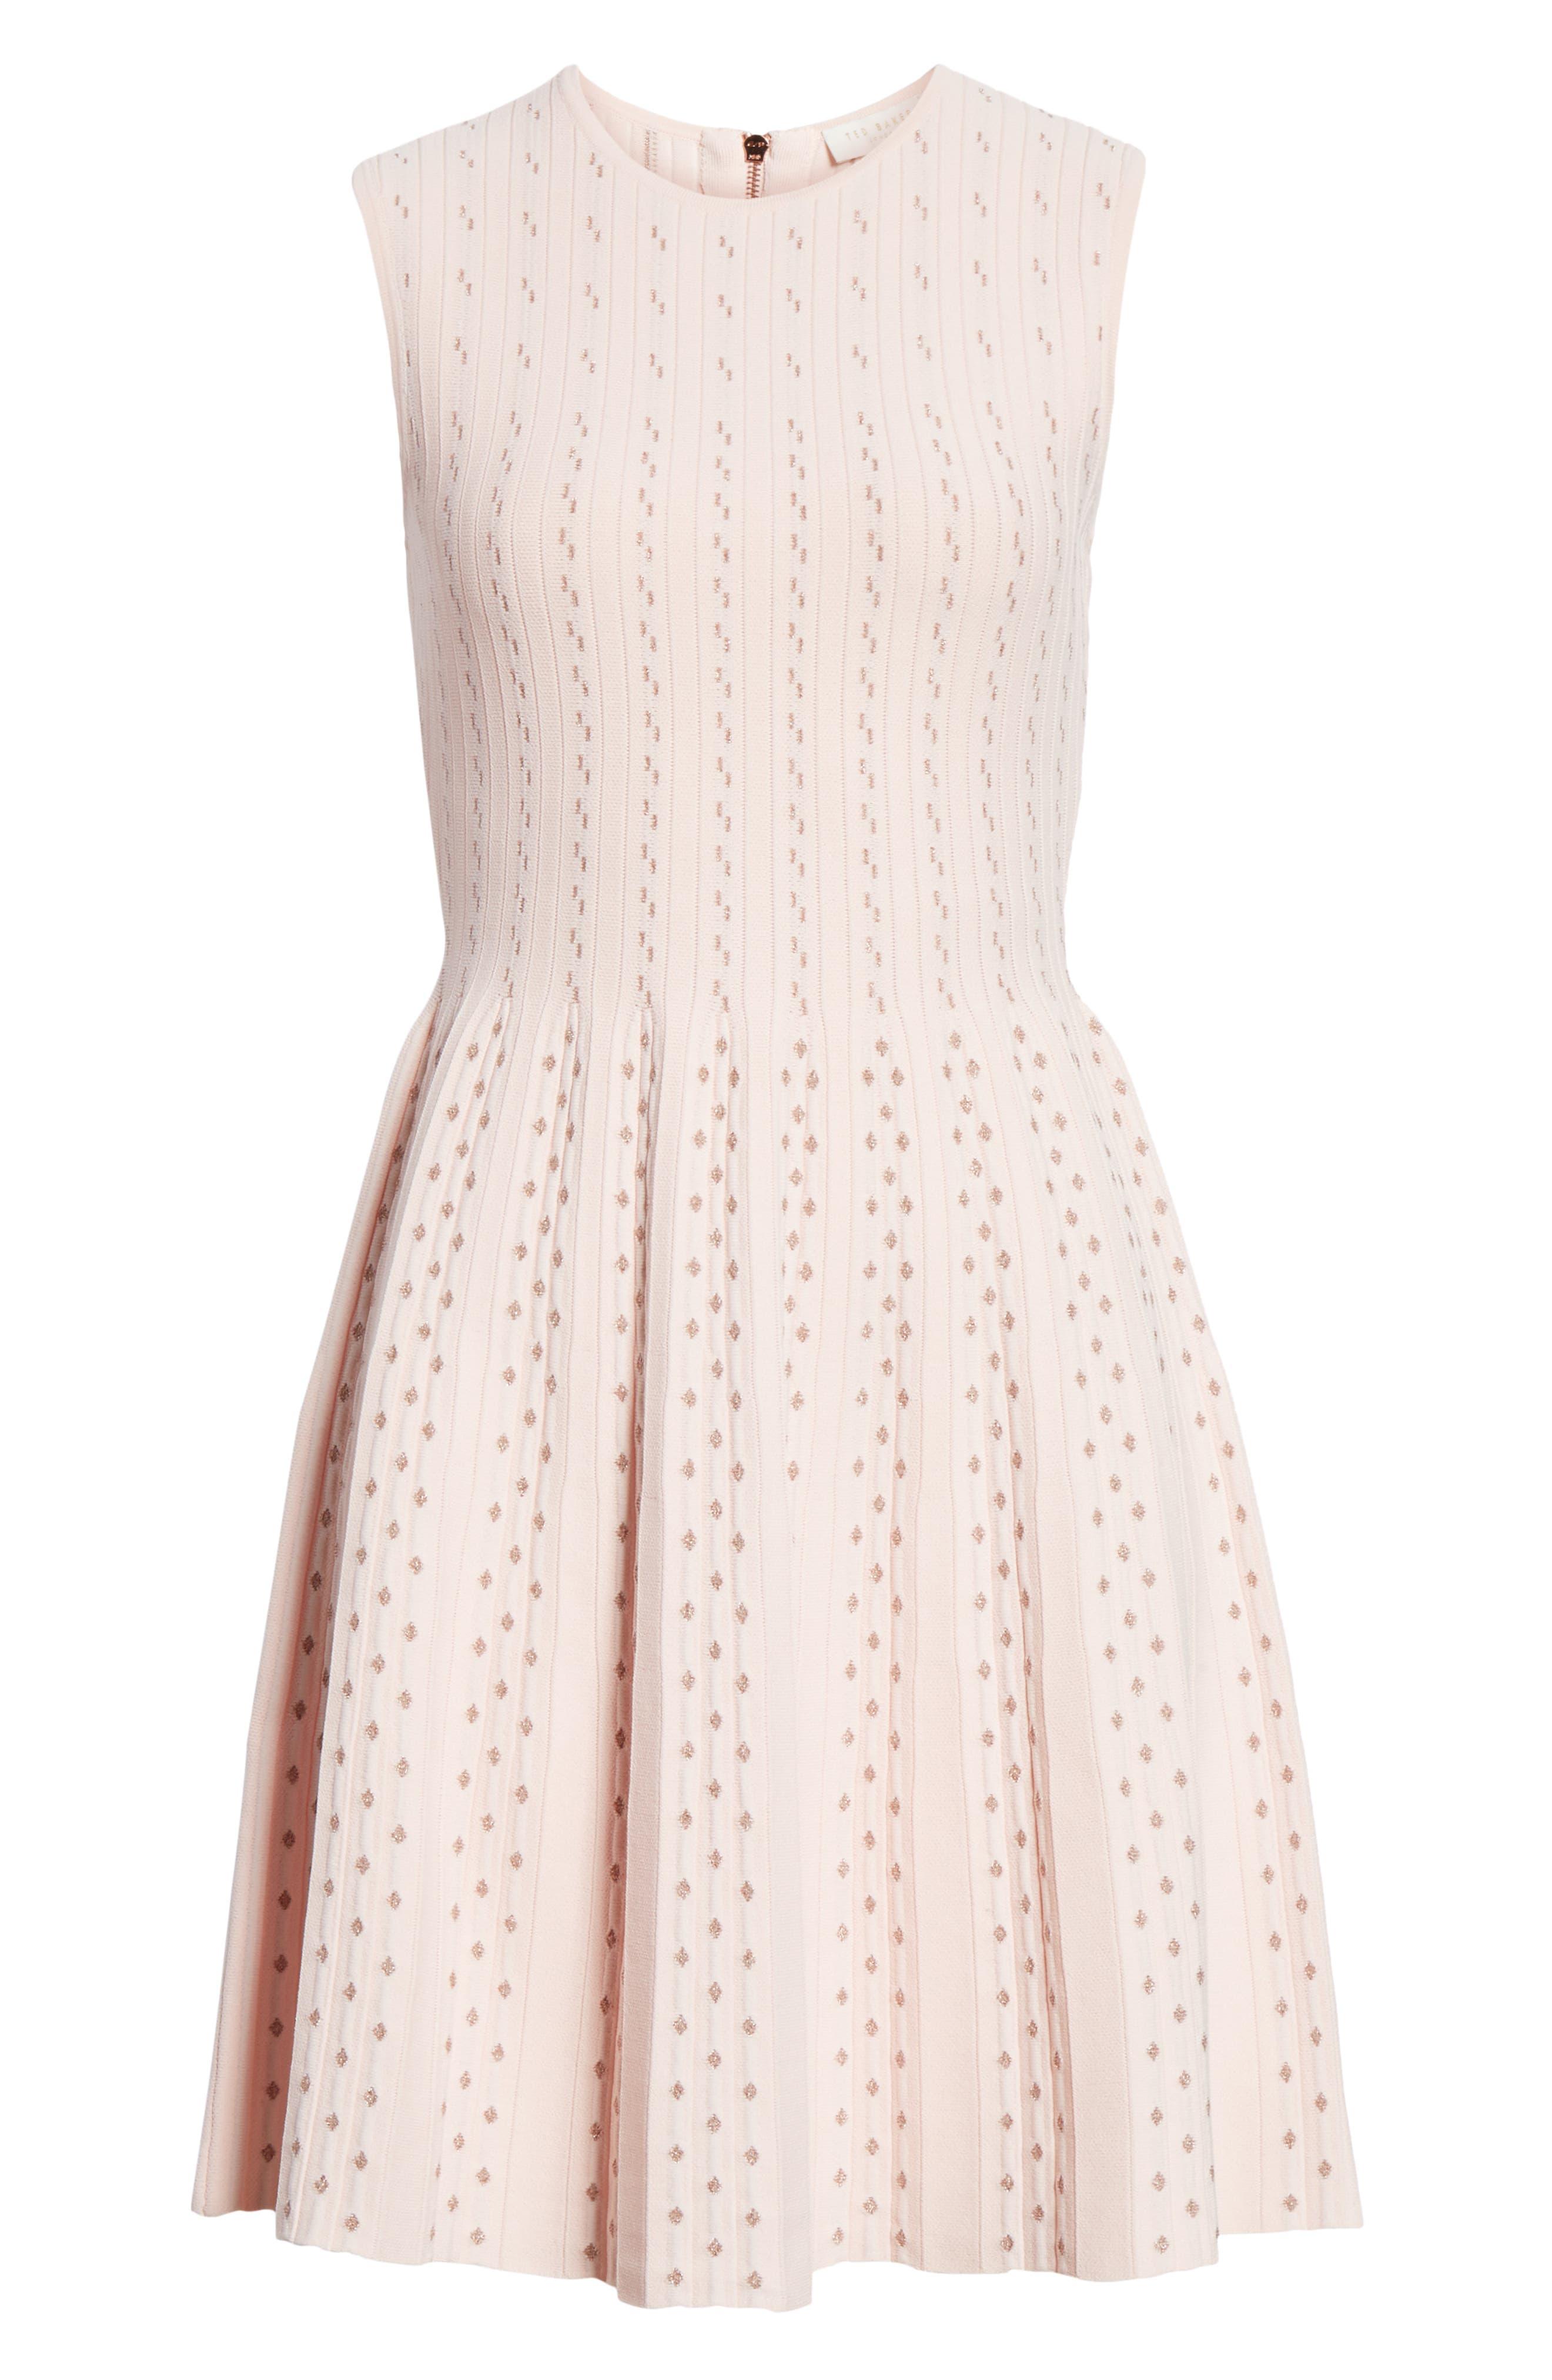 Vellia Flippy Knit Skater Dress,                             Alternate thumbnail 7, color,                             PALE PINK